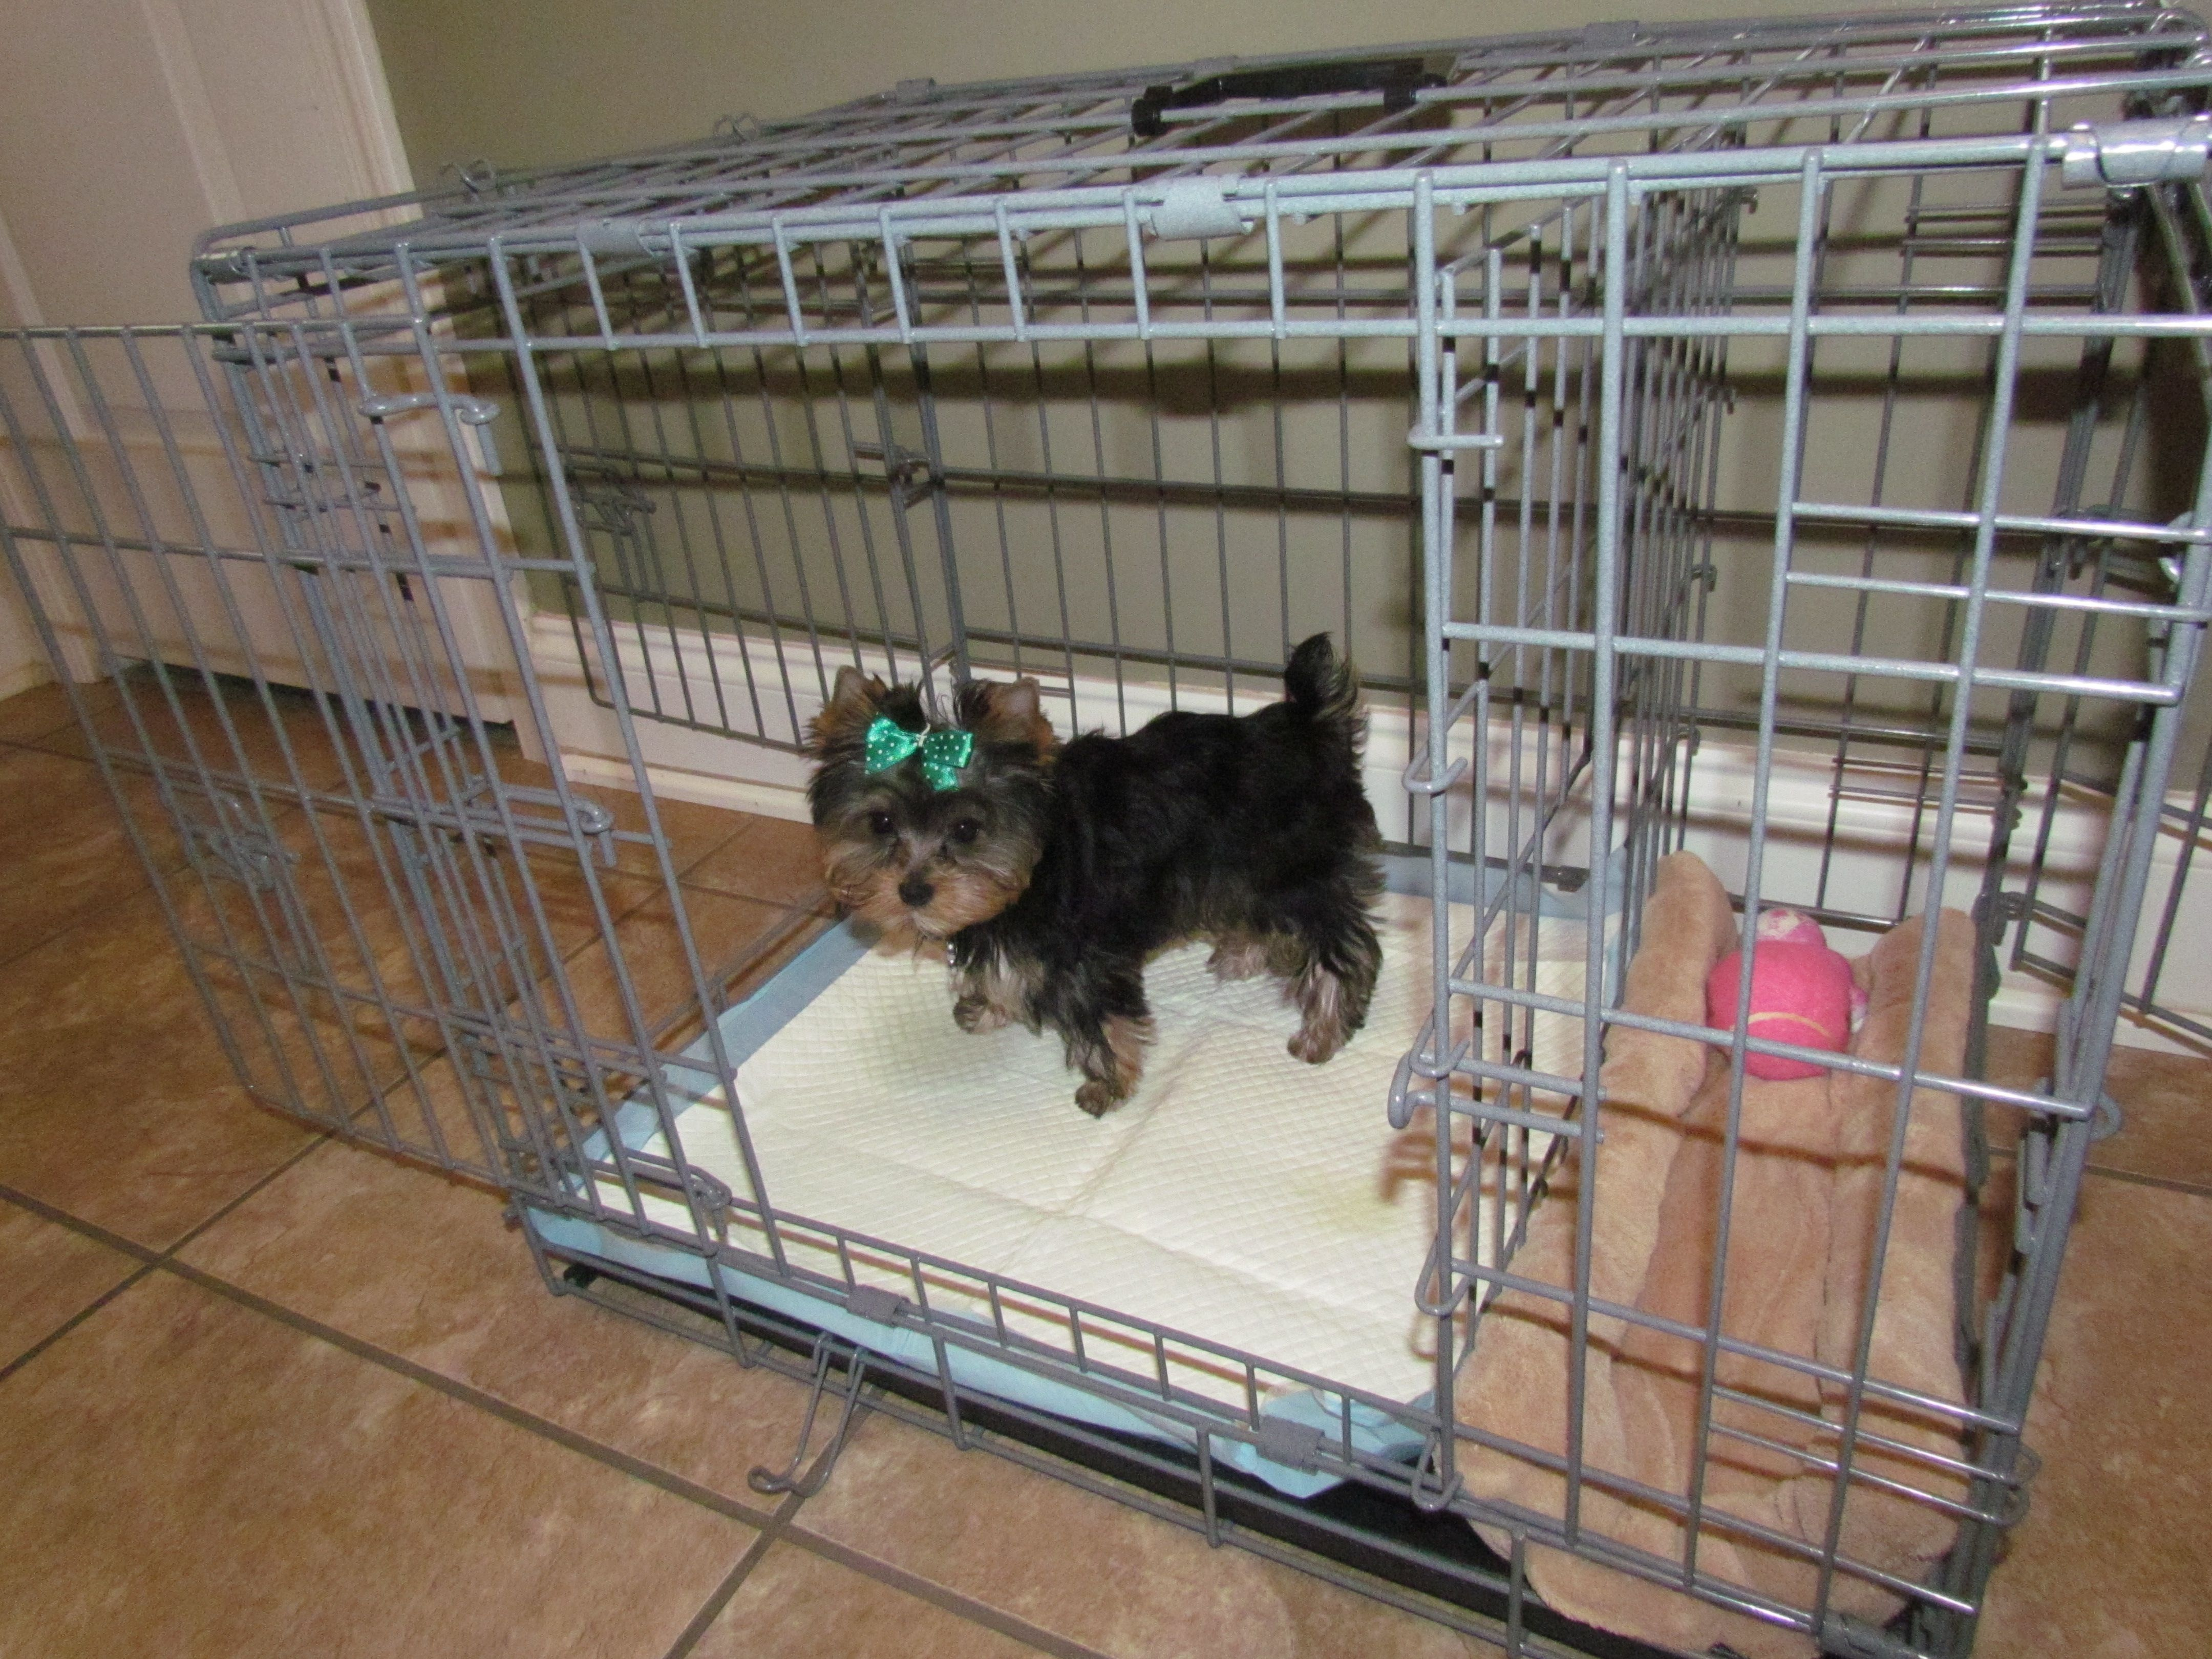 Dog Toilet Training – The Modern Method